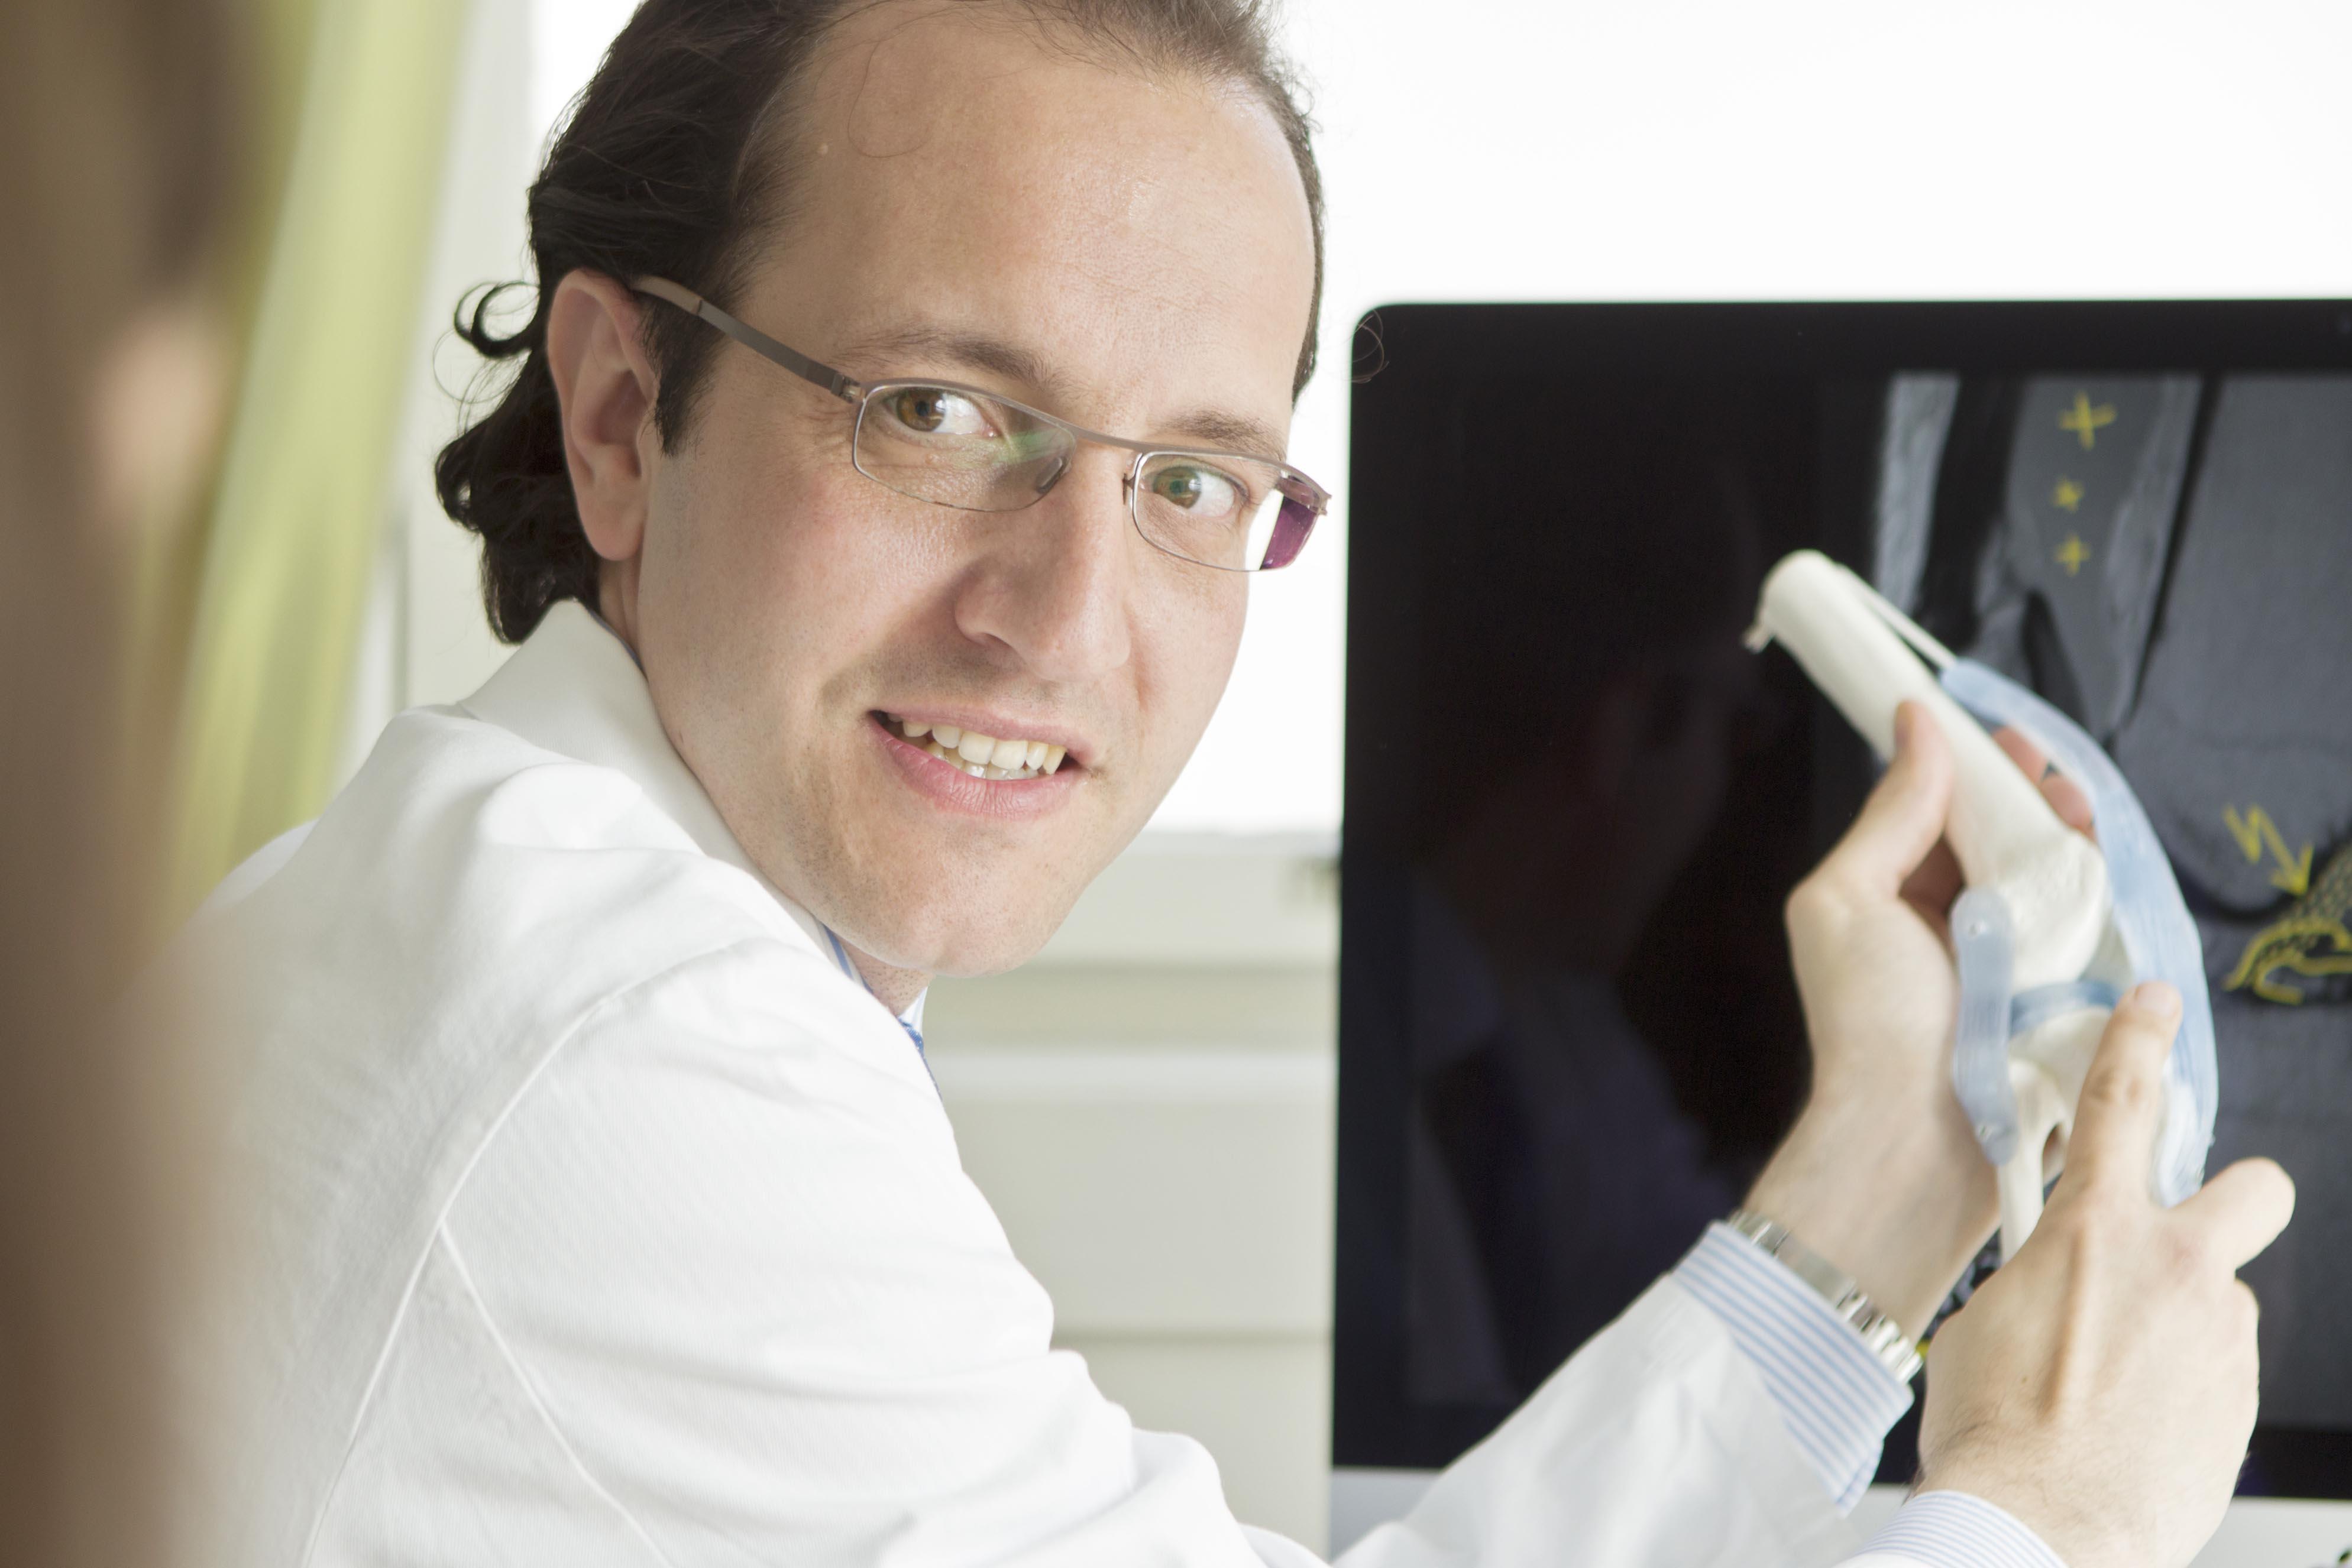 prof. friedrich mrt 6